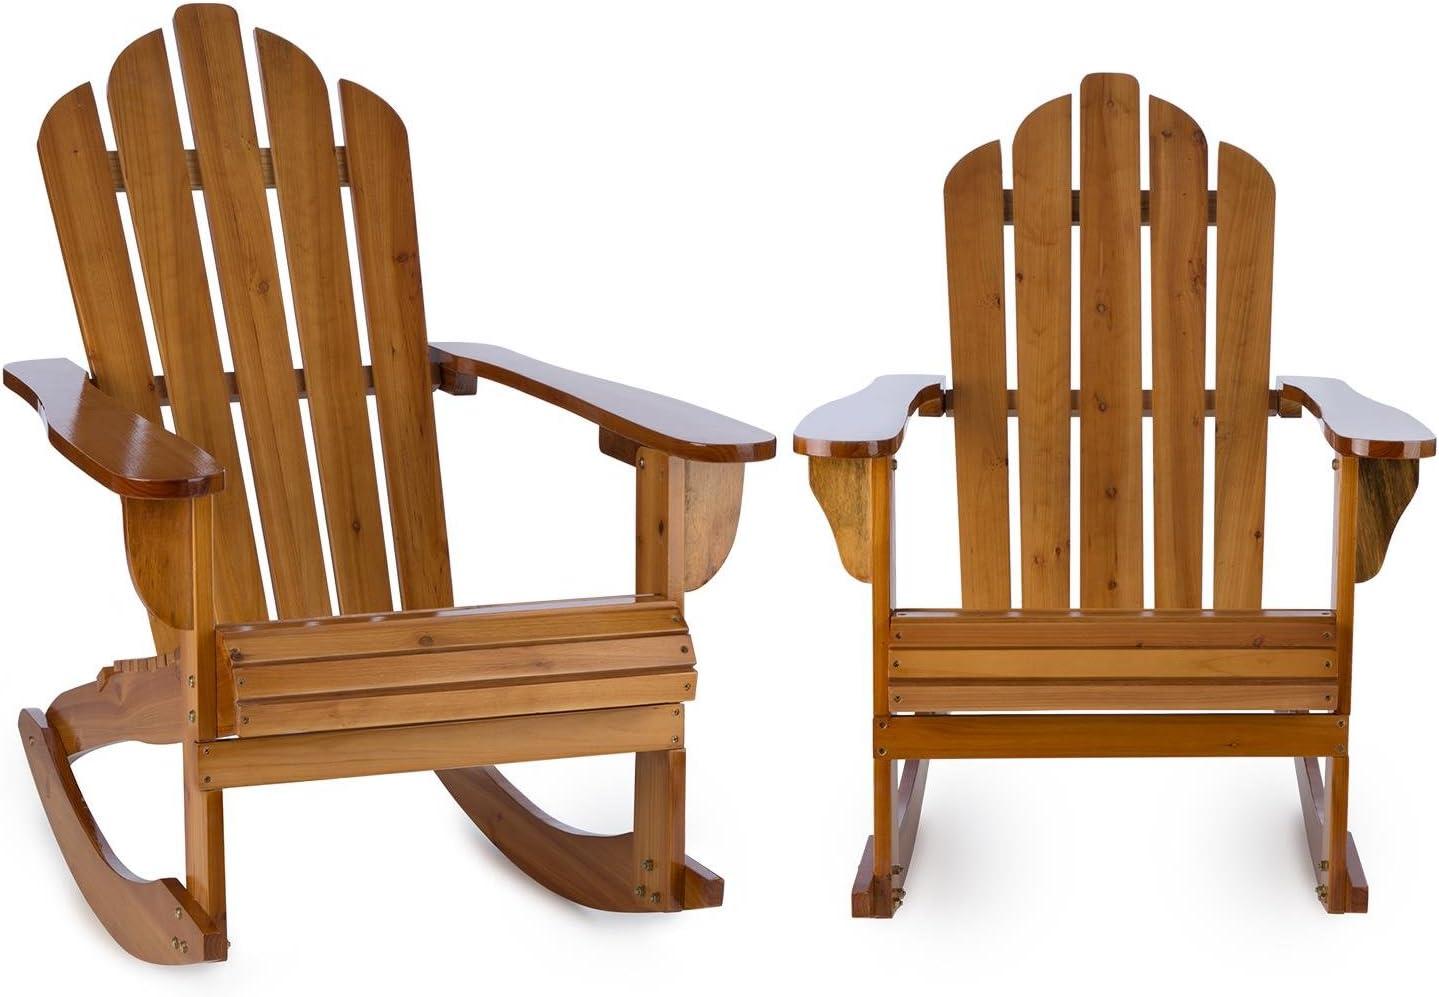 blumfeldt Rushmore Set 2 sillas de jardín Estilo clásico Adirondack (Madera de Pino, 71x95x105 cm, Plegable, Resistente a Intemperie) - marrón